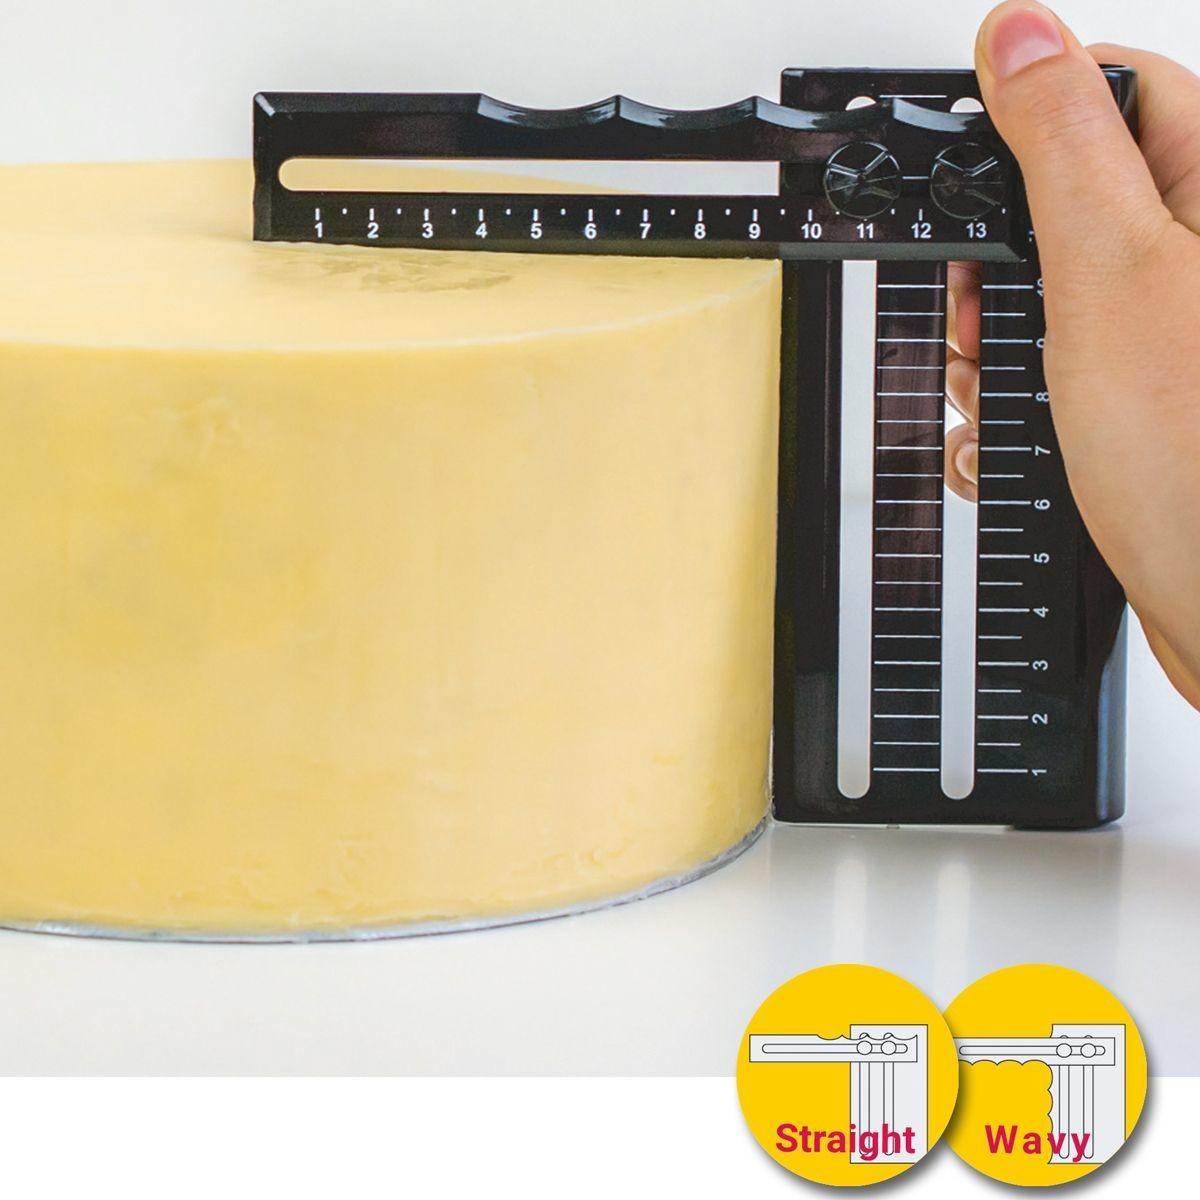 SALE!!! Dekofee Edgy Froster Set -Straight & Wavy - Εργαλείο για αιχμηρές άκρες και πλευρές.